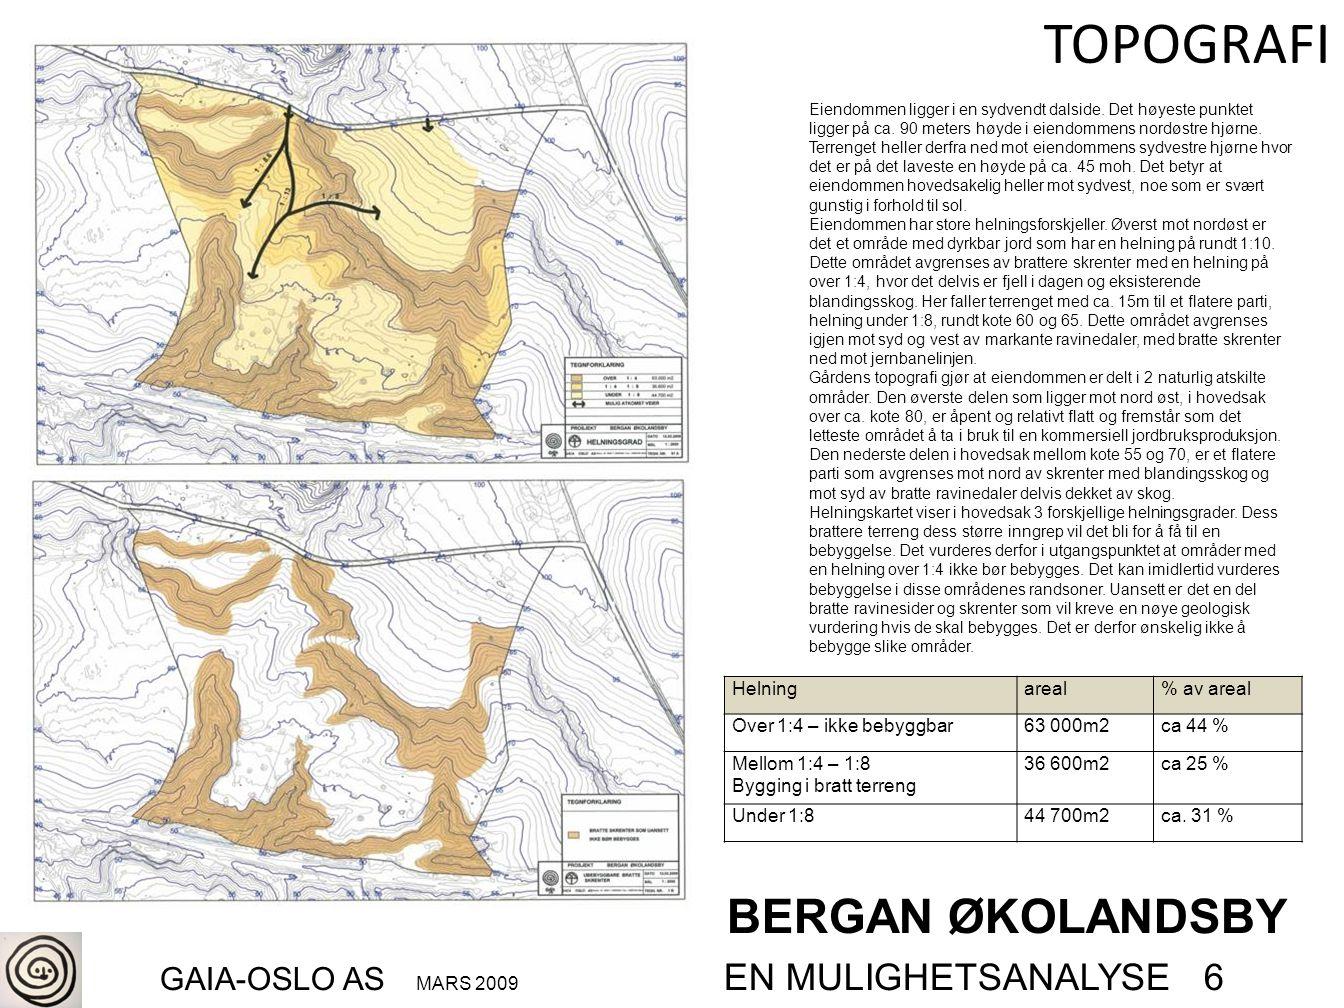 BERGAN ØKOLANDSBY GAIA-OSLO AS MARS 2009 EN MULIGHETSANALYSE 6